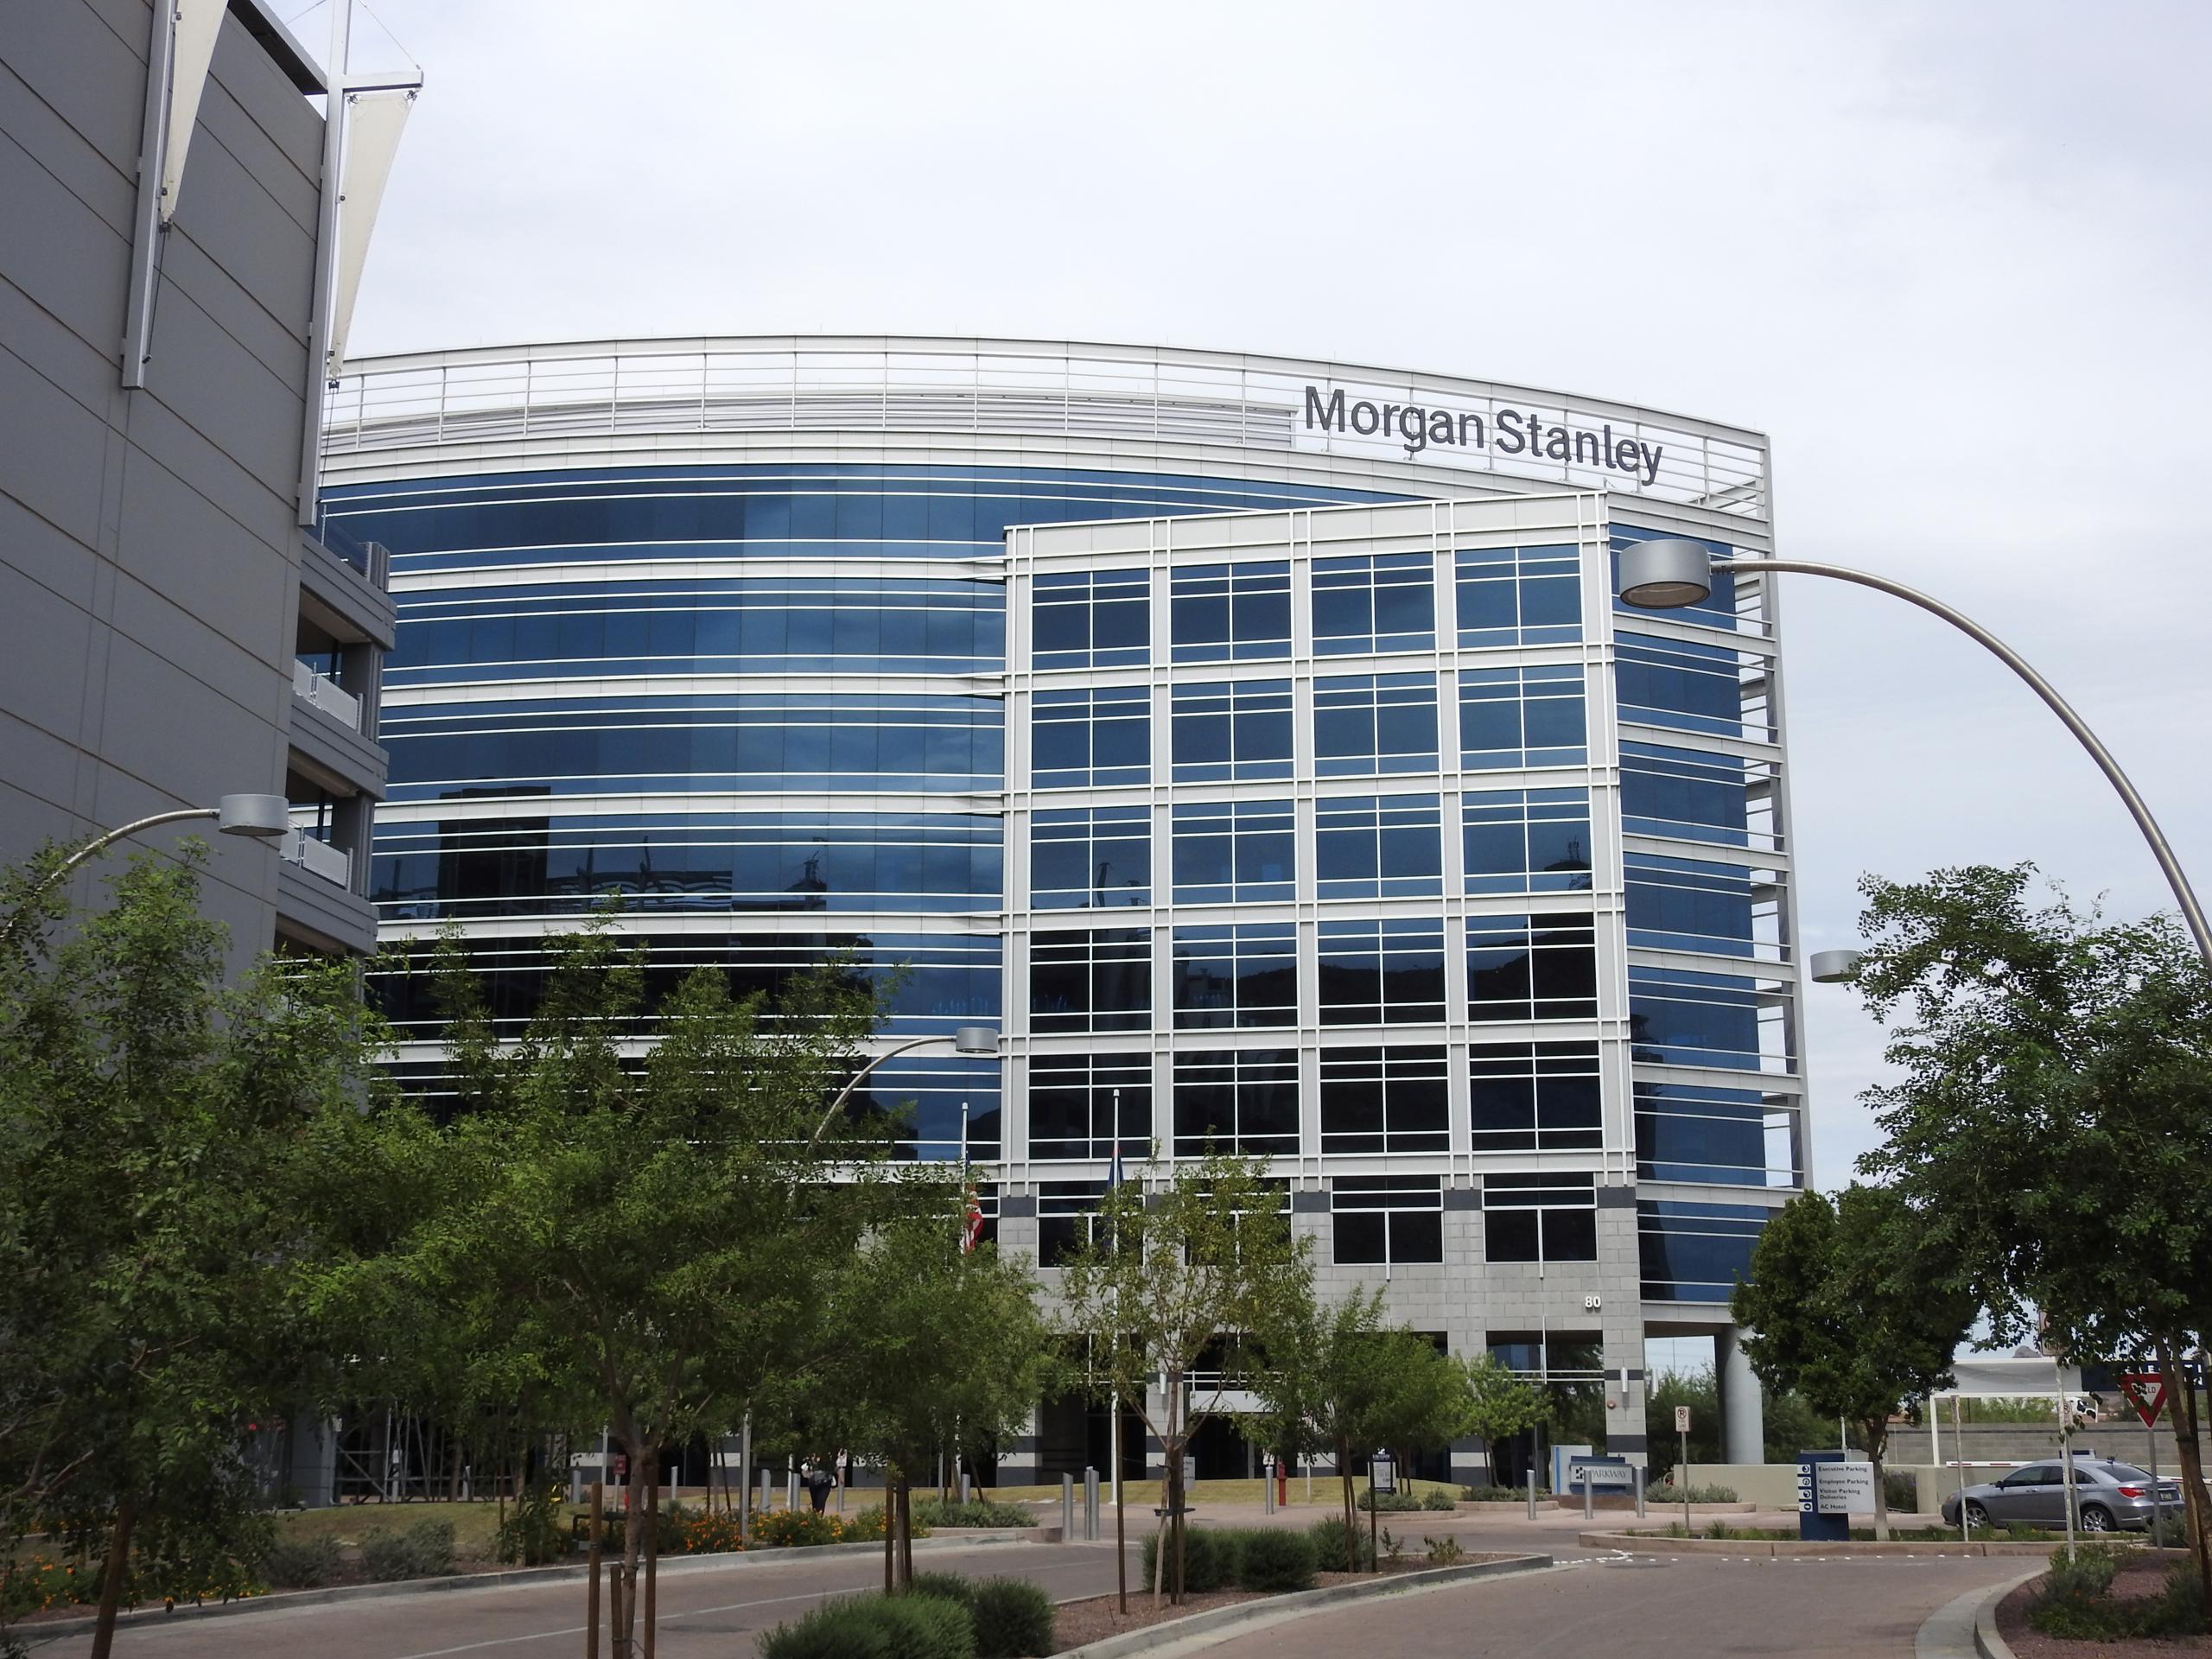 Morgan Stanley office in Tempe, Arizona.